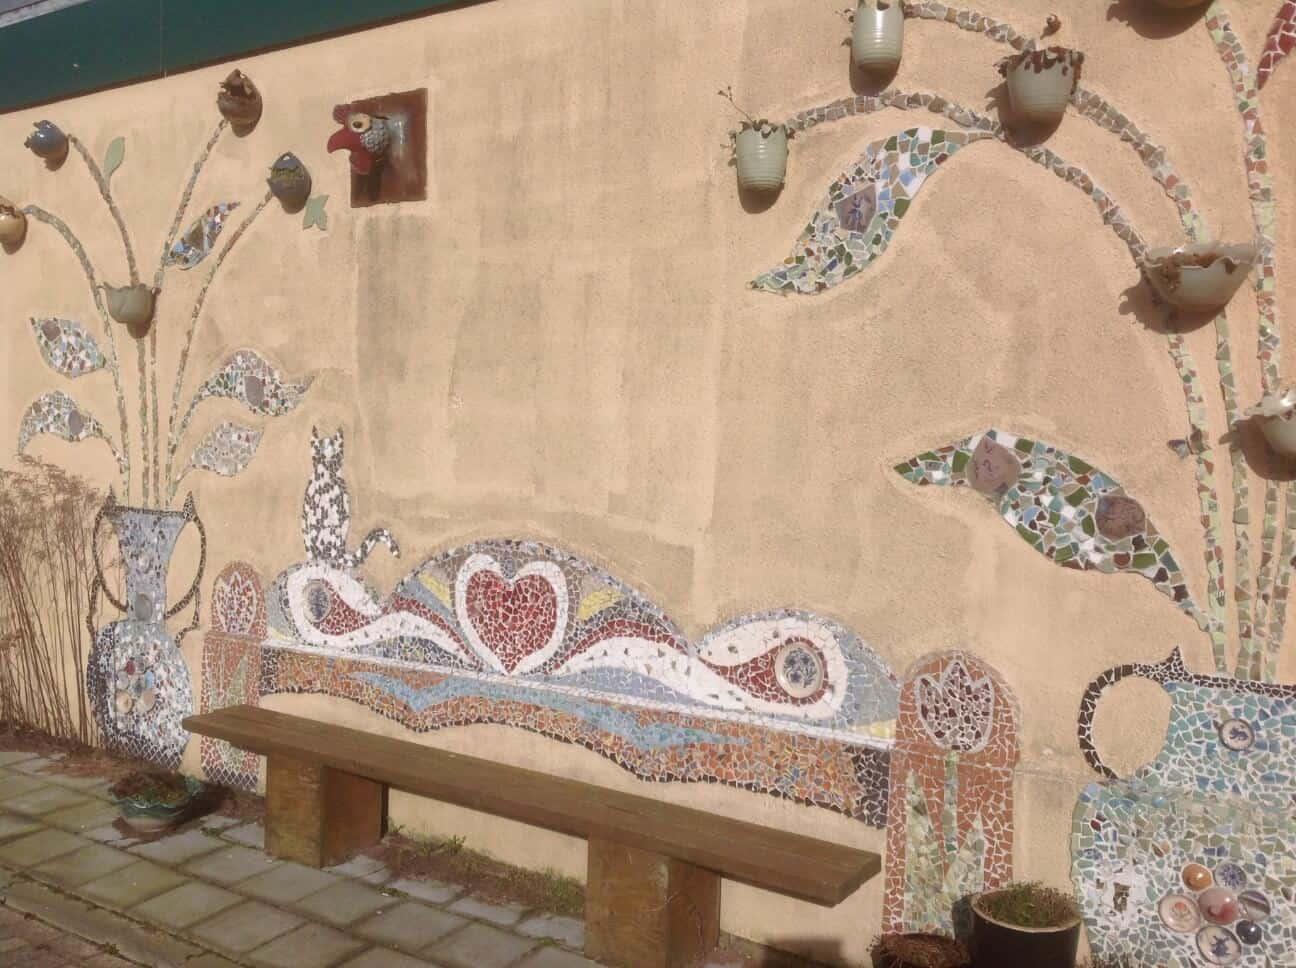 Fantasie mozaiek muur